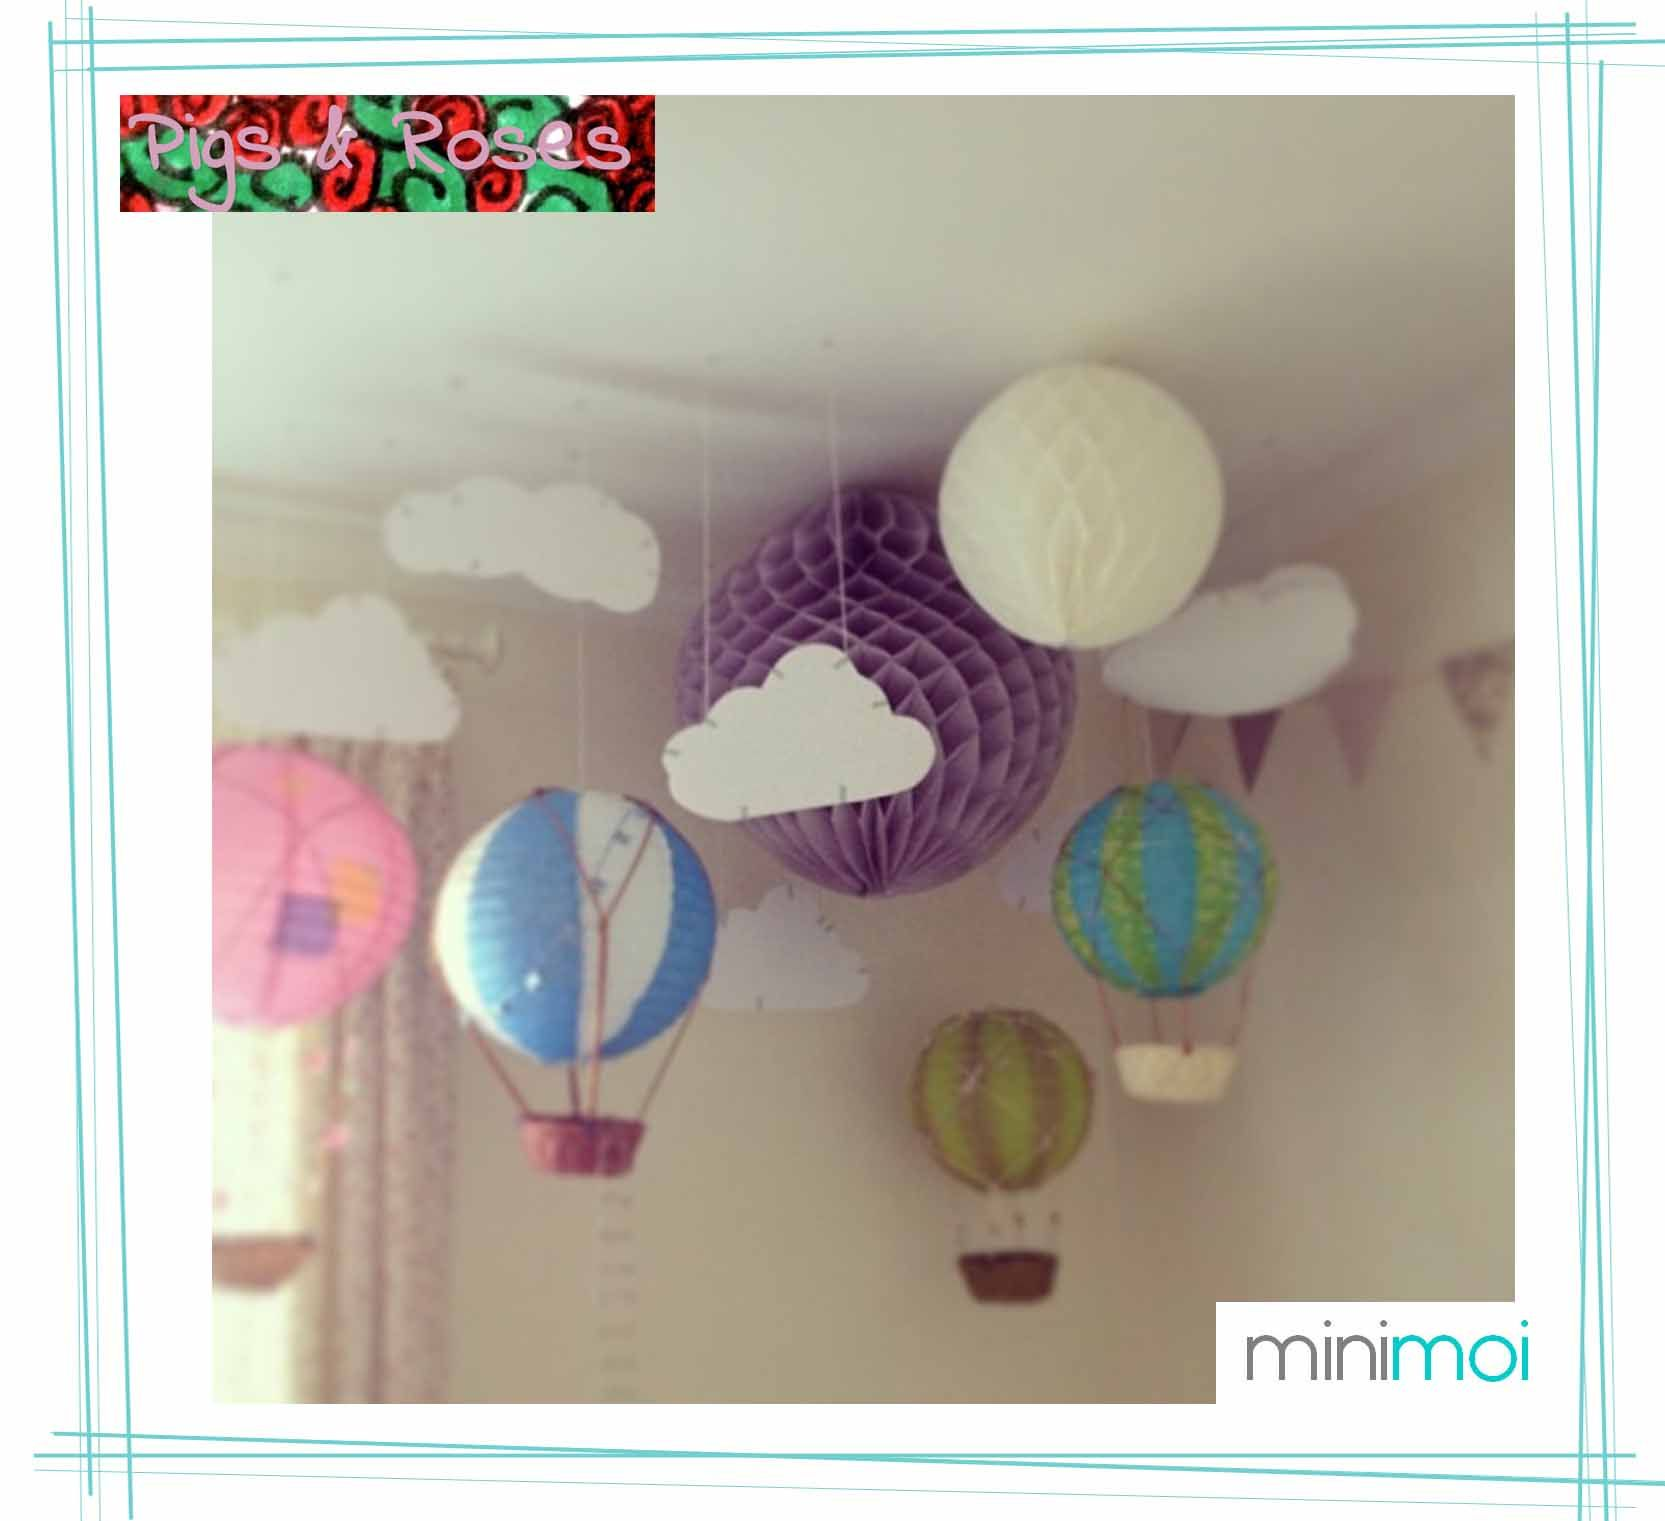 globos de papel decoracin habitacin bebe buscar con google